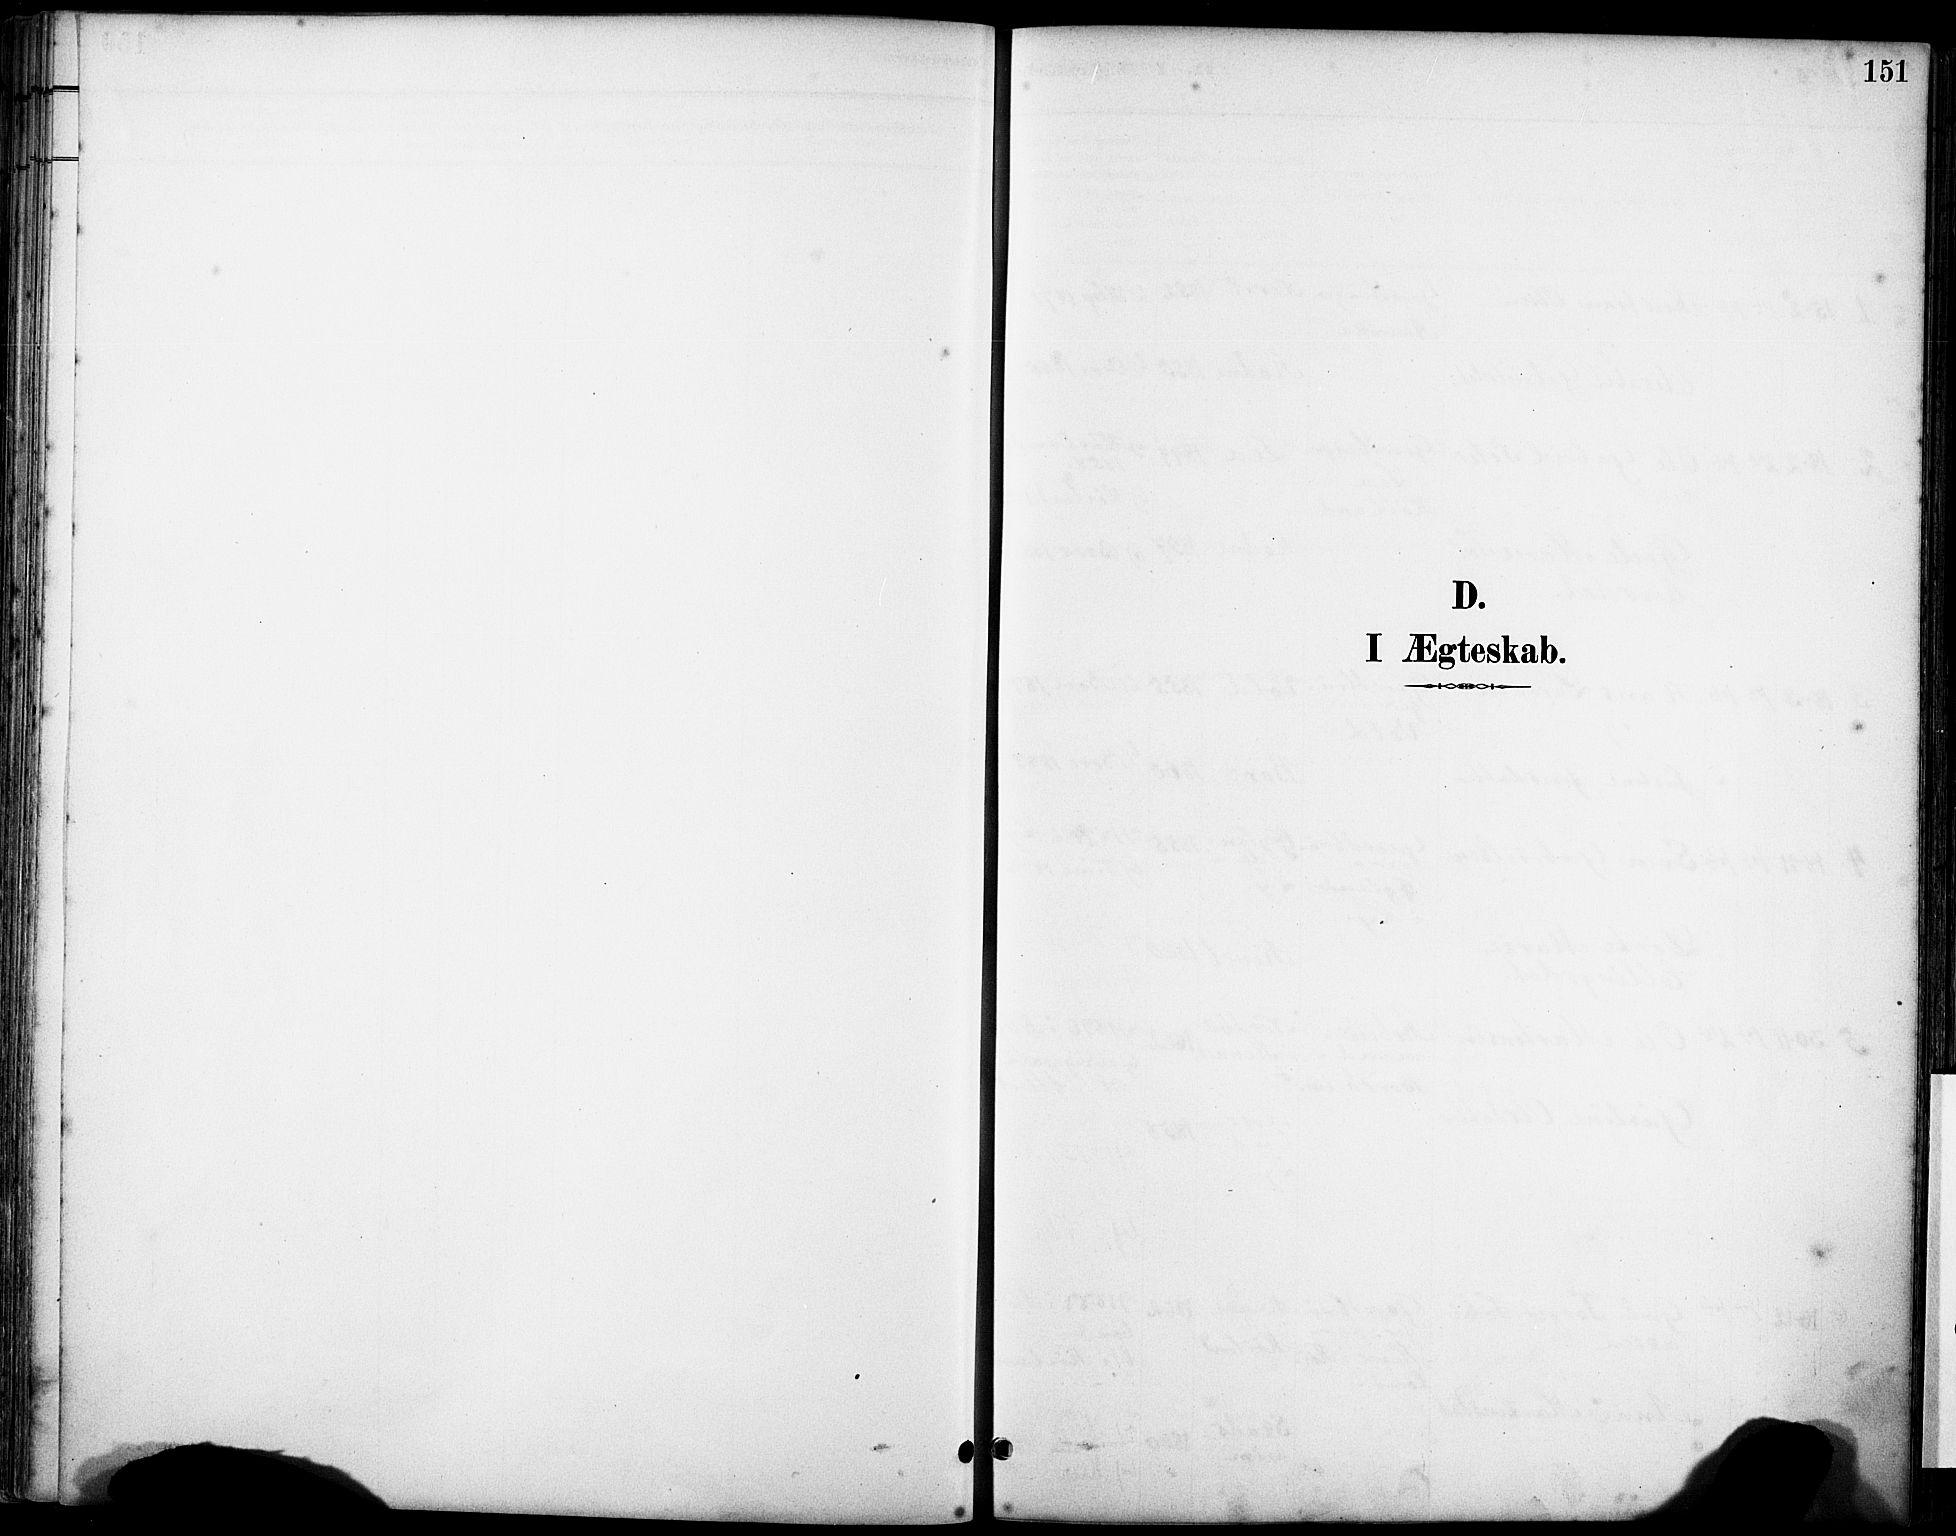 SAST, Klepp sokneprestkontor, 3/30BA/L0008: Ministerialbok nr. A 9, 1886-1919, s. 151